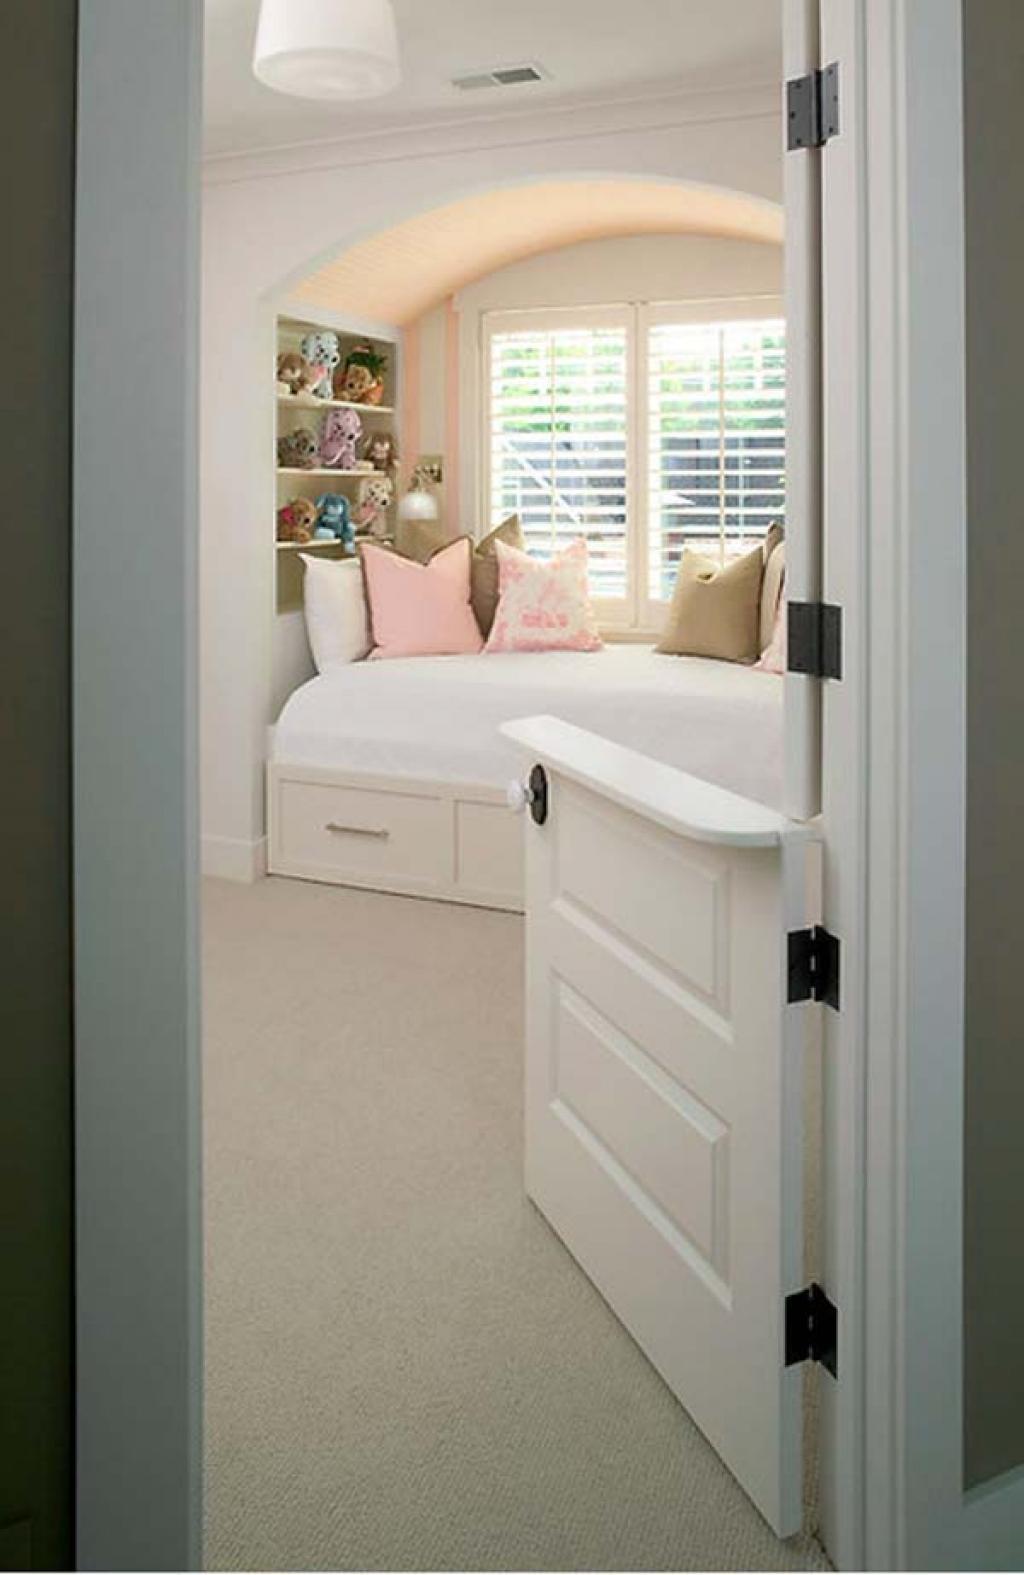 Aeration Chambre Sans Fenetre Ma Superbe Chambre Sans Fentre - Aeration salle de bain sans fenetre